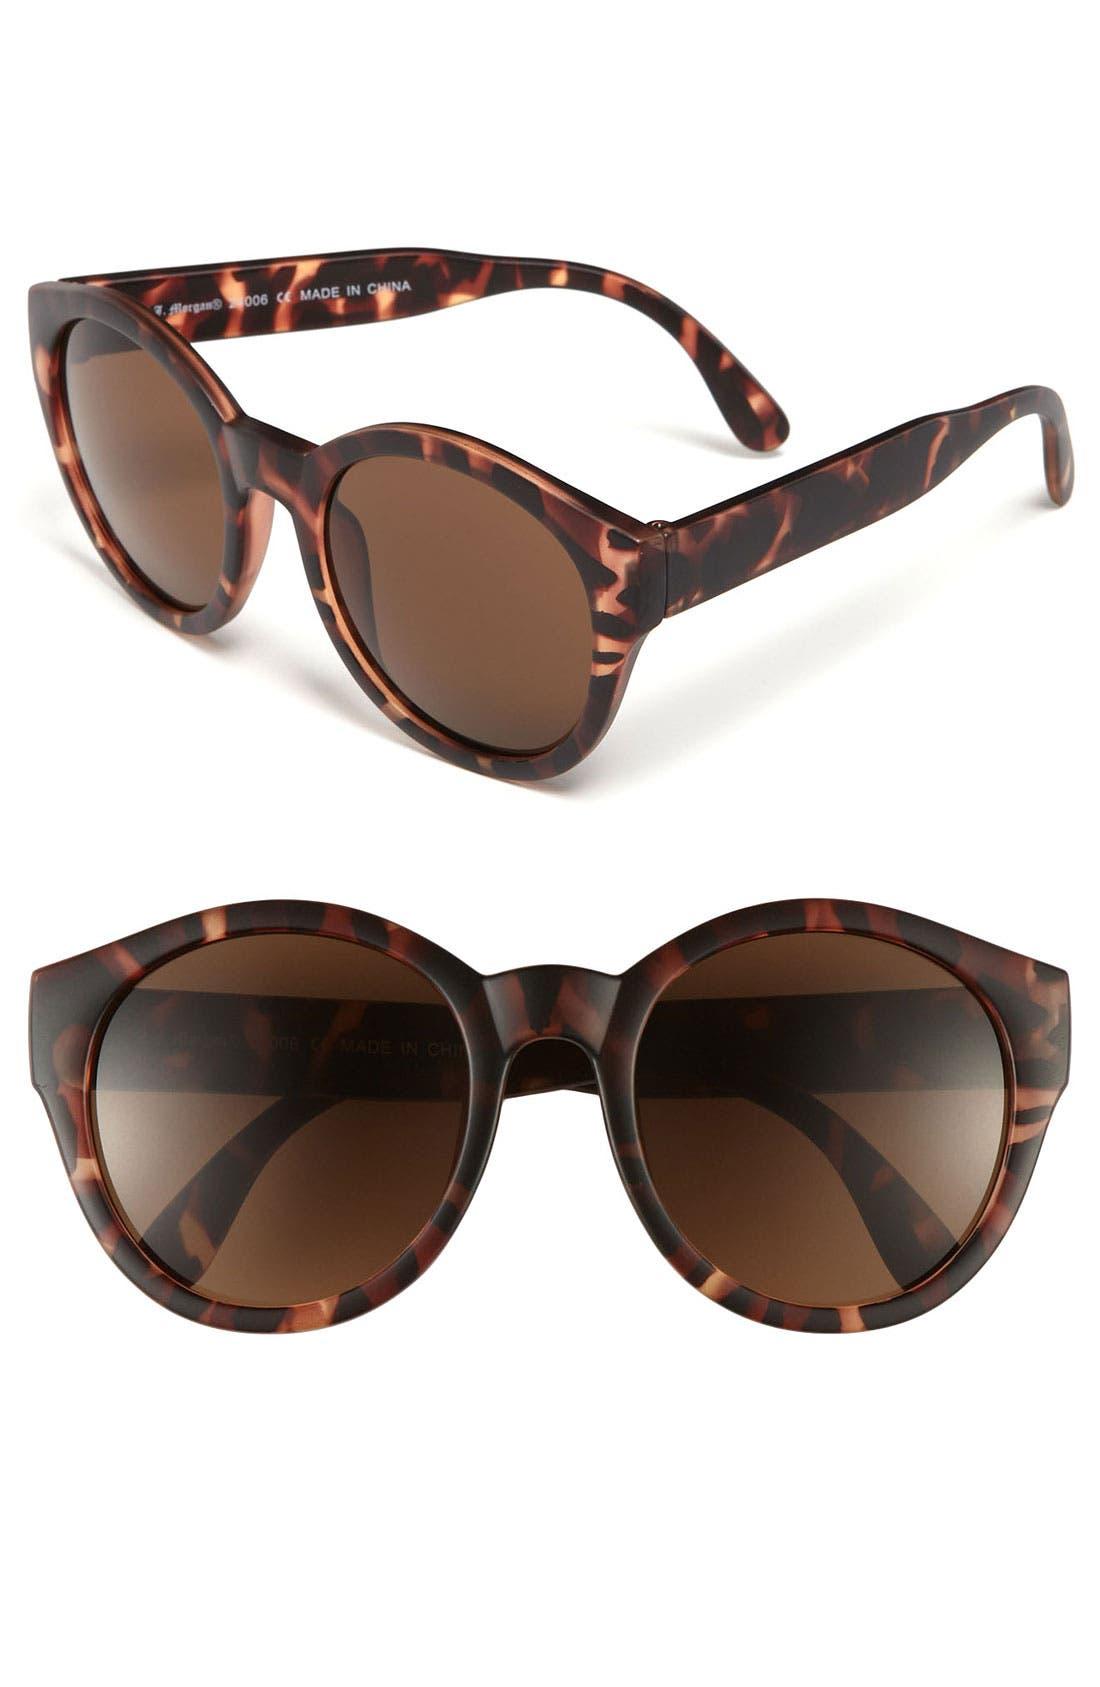 Main Image - A.J. Morgan 53mm 'Miss Brooks' Retro Sunglasses